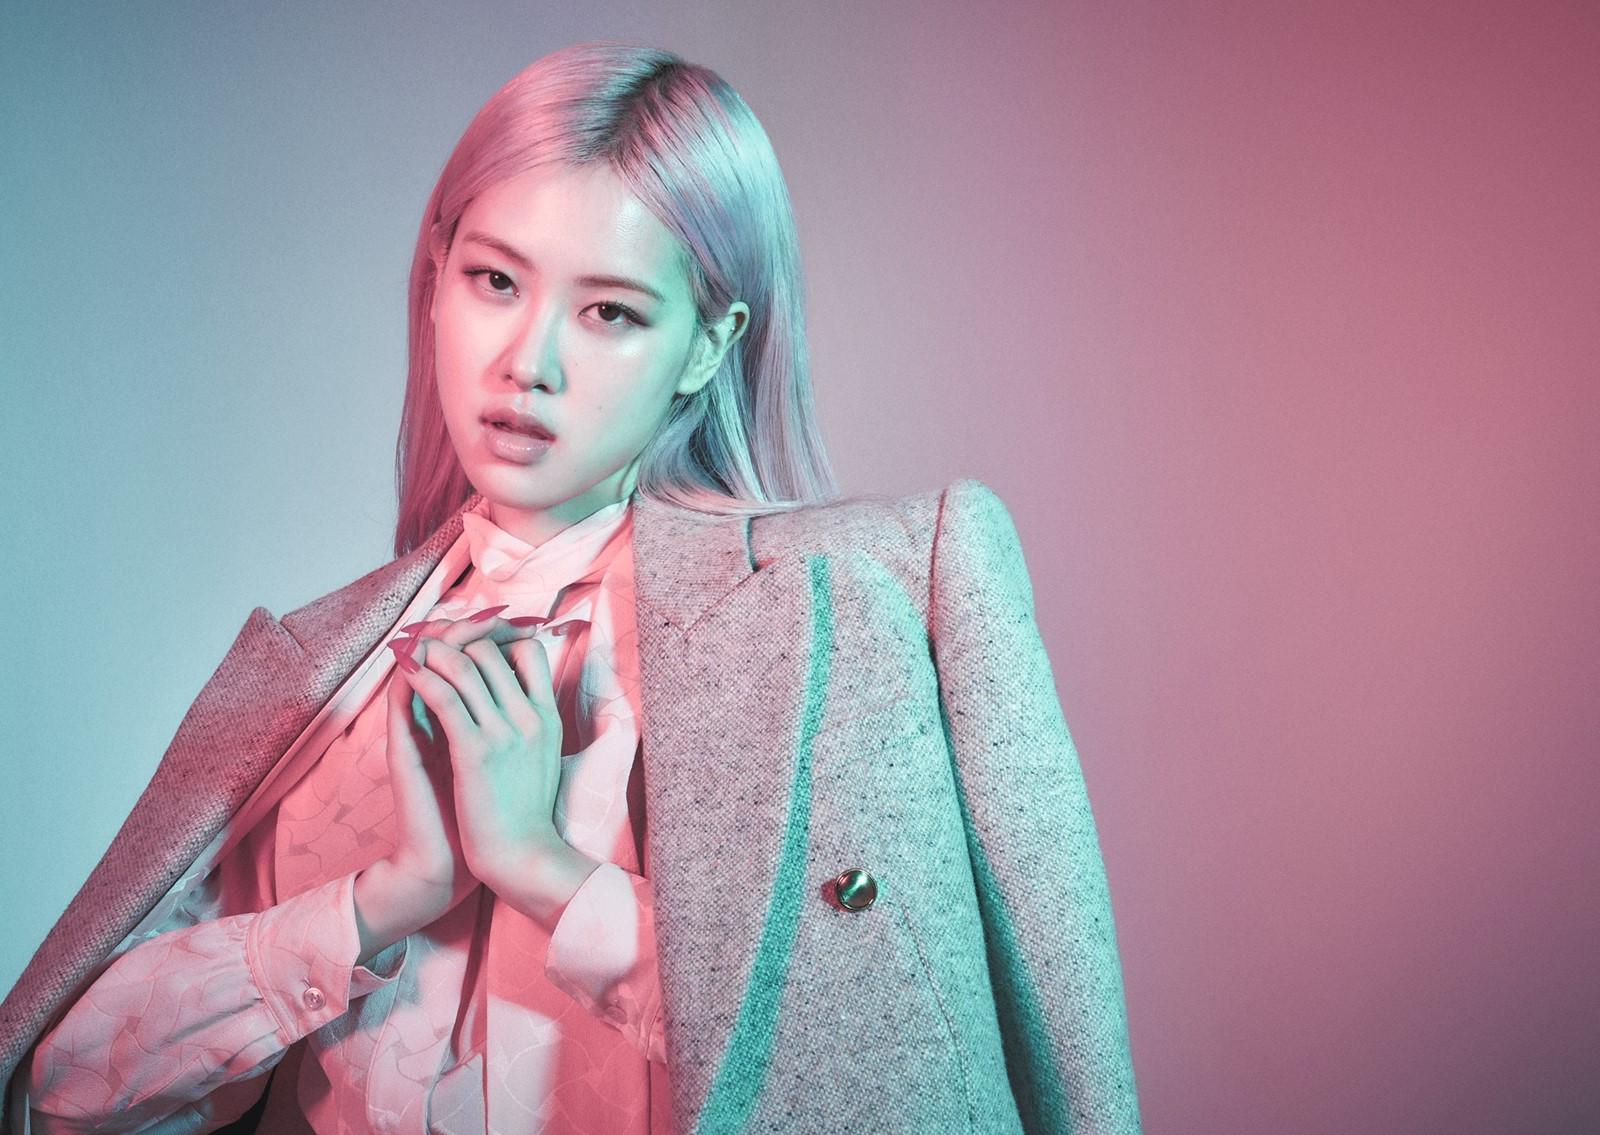 Rosé的solo舞台即将公布,YG想要成功要解决两大难题